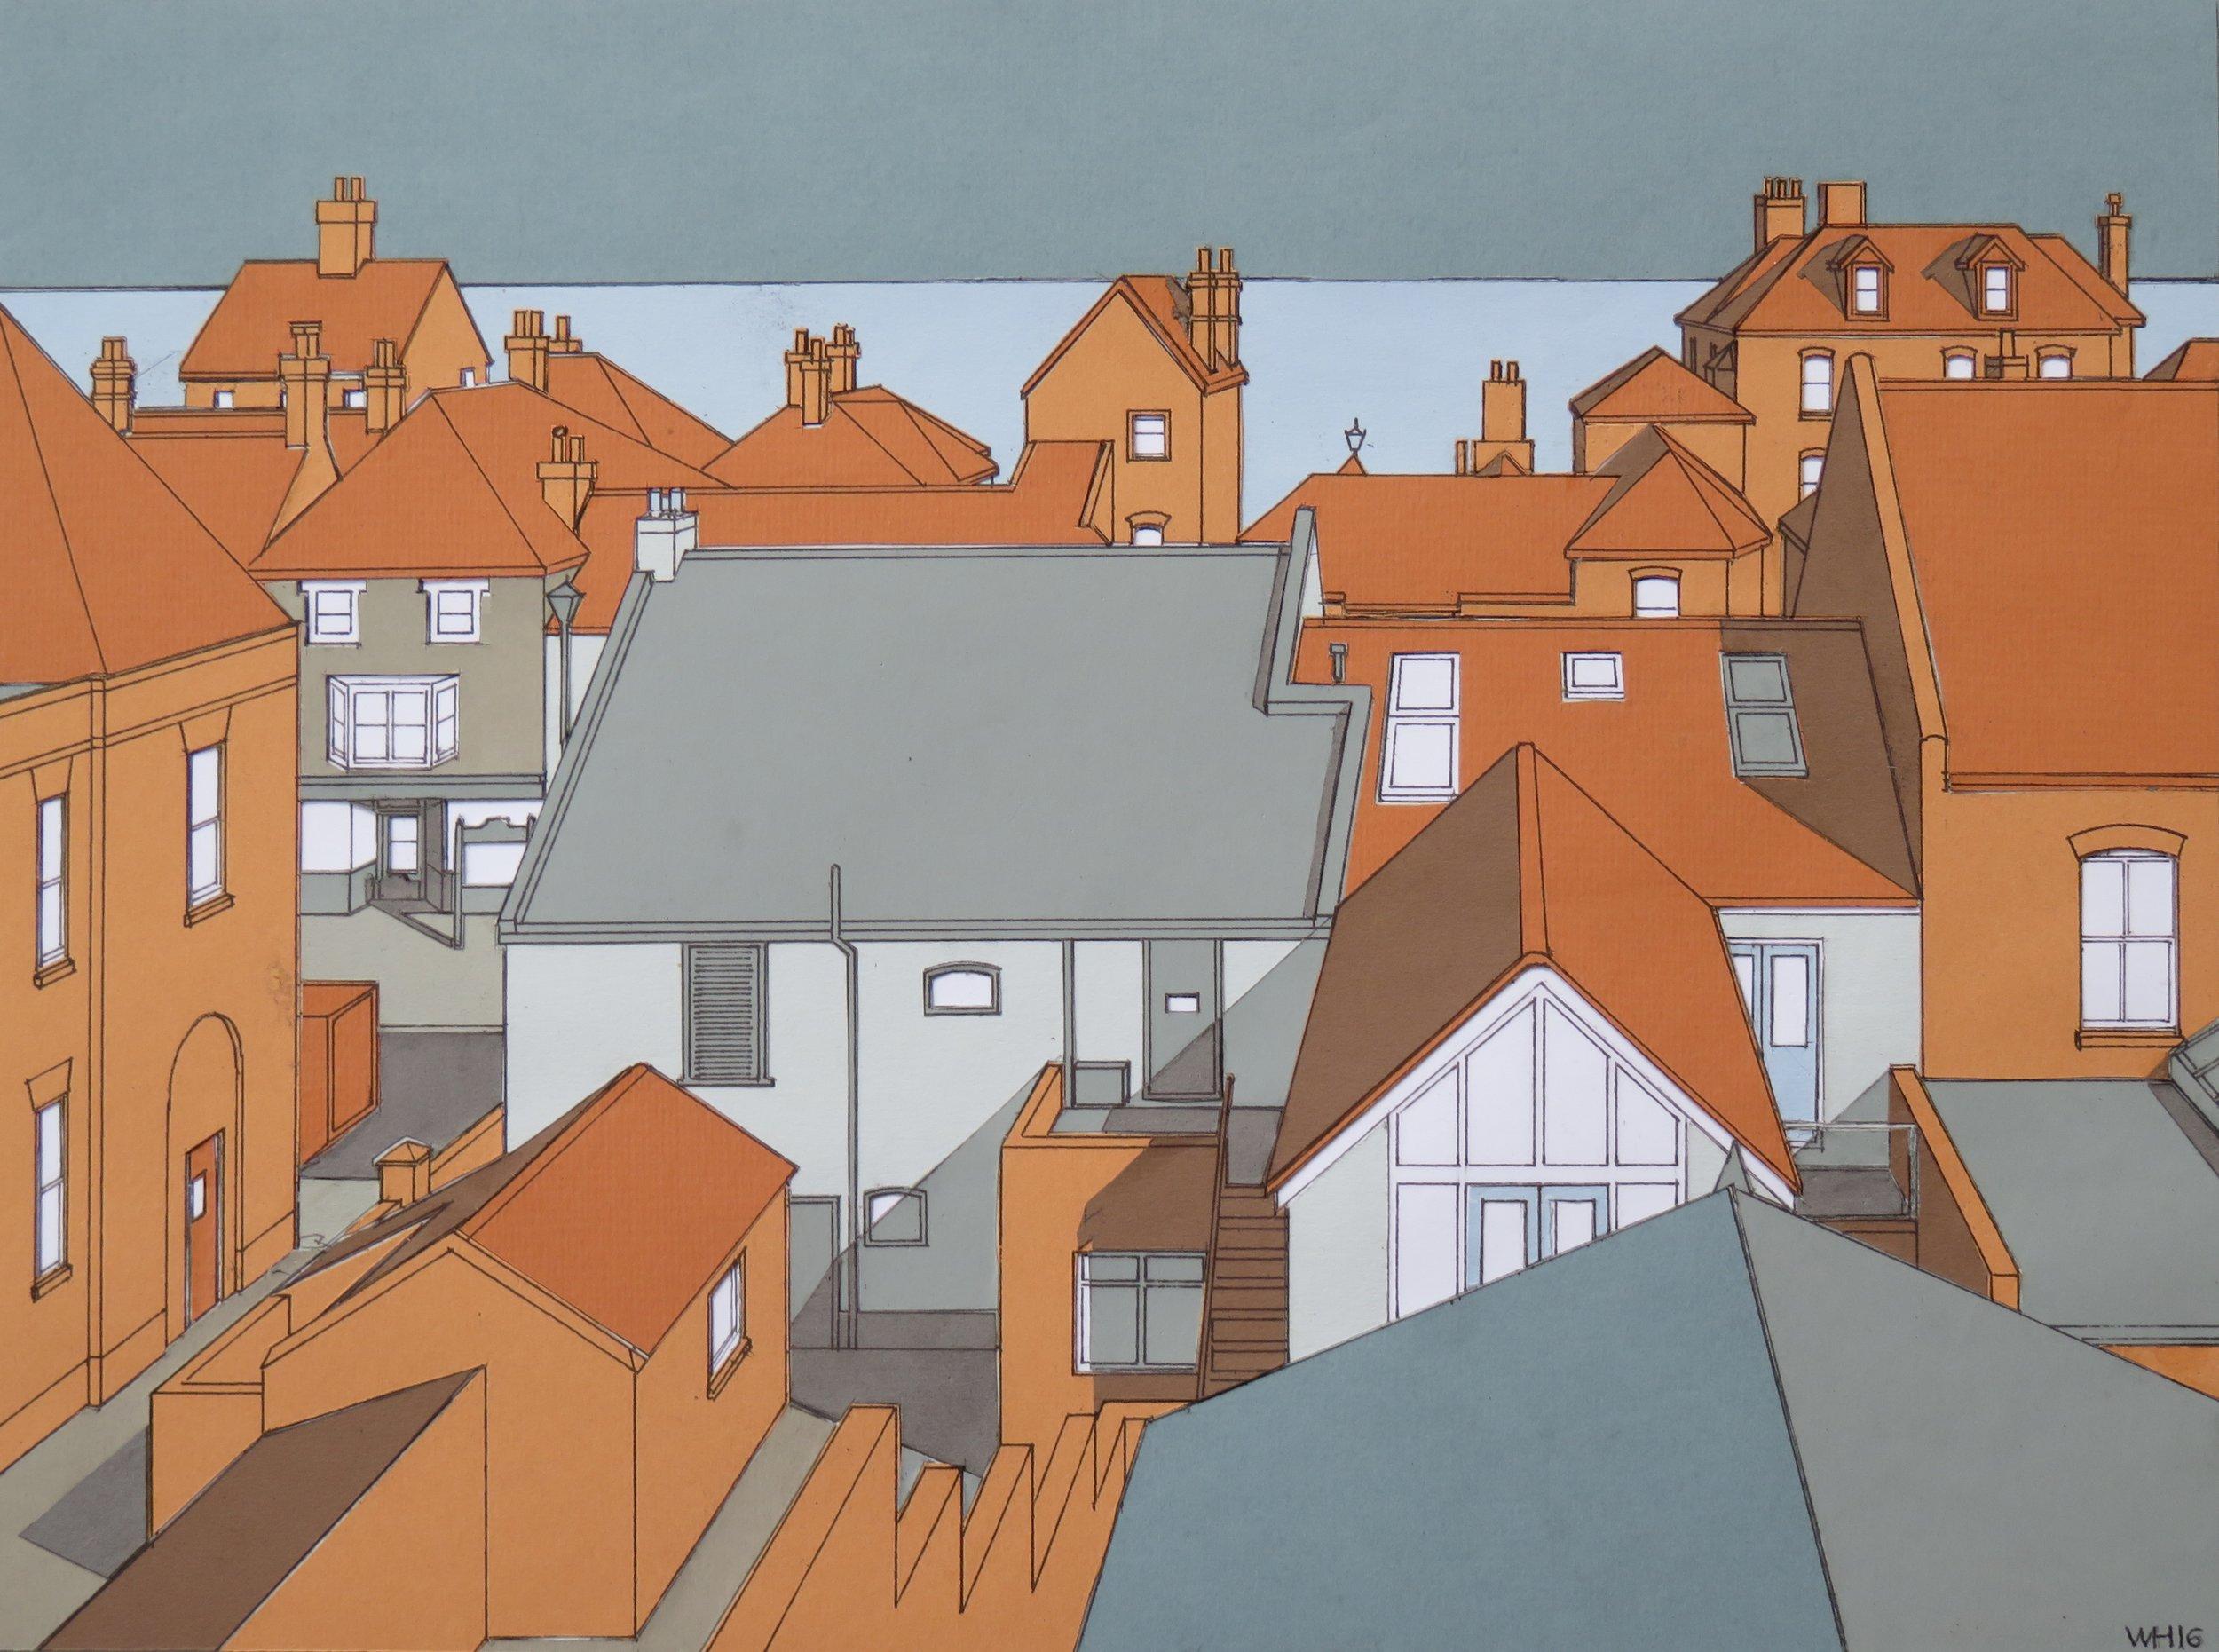 Aldeburgh Roofs